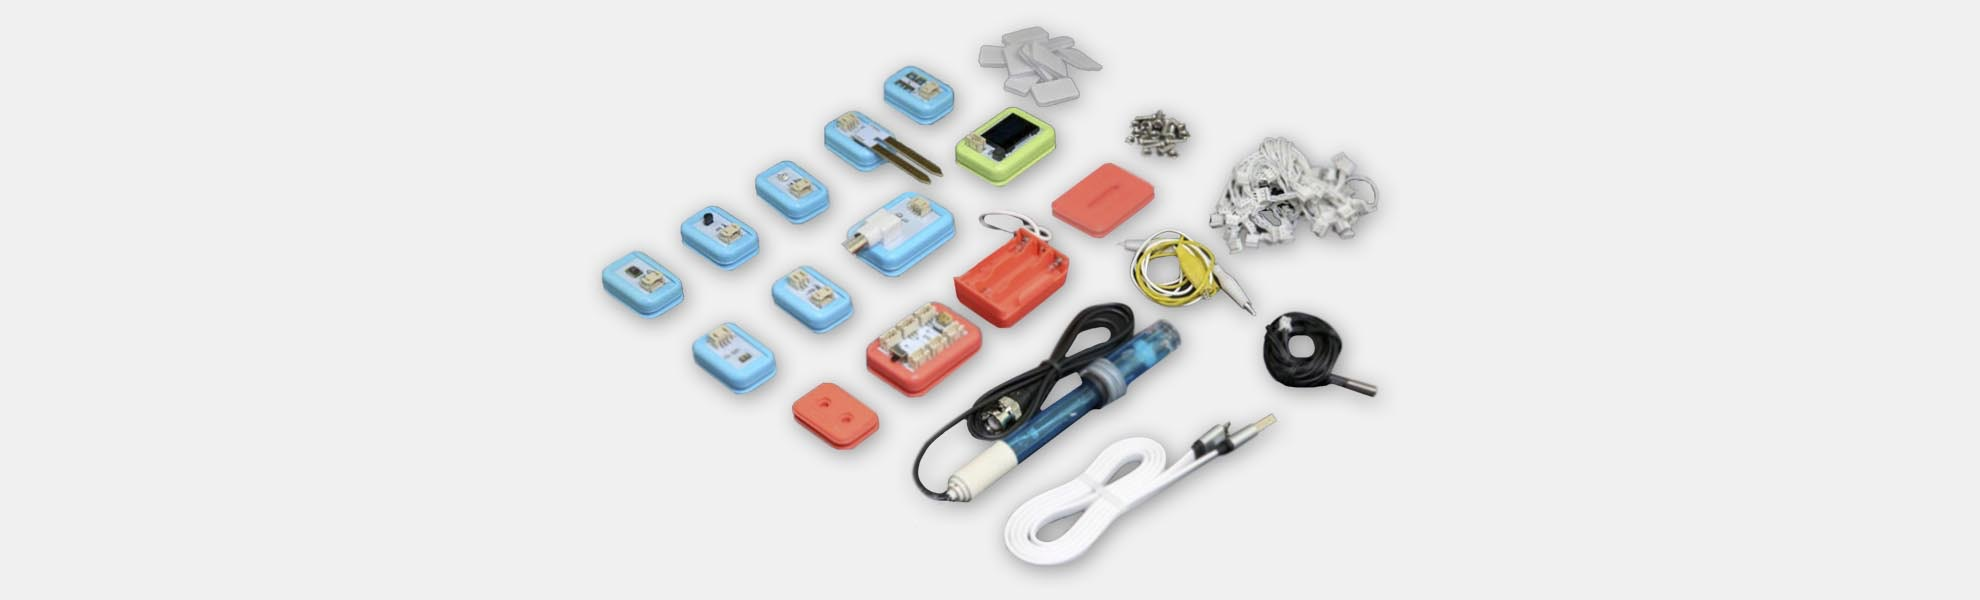 DFRobot Boson Science Kit